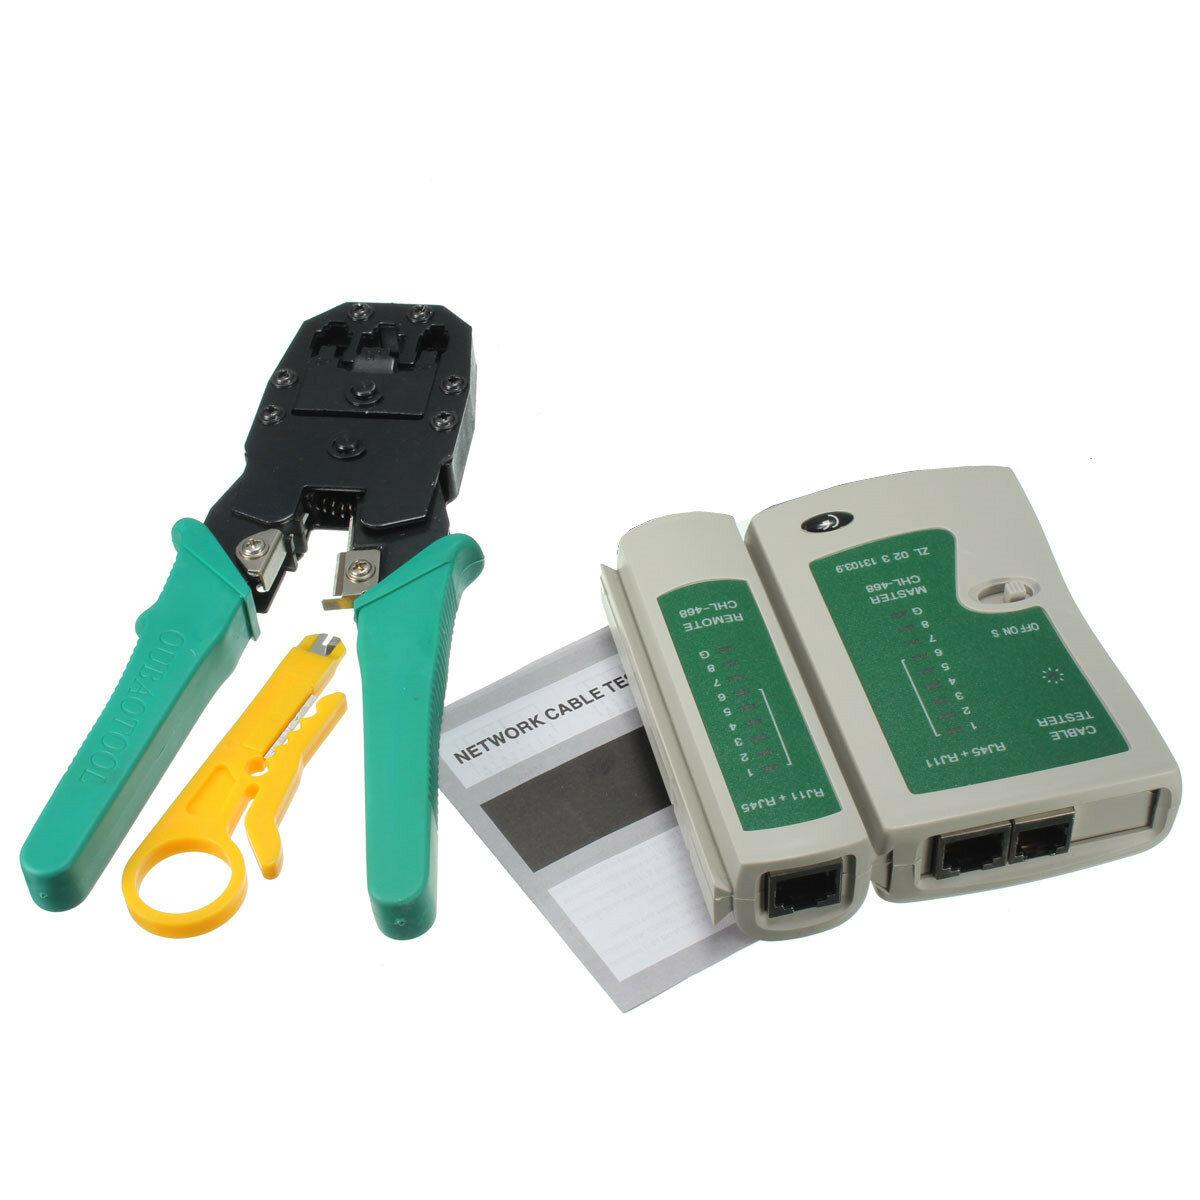 Rj12 Wiring Cat5 Control Diagram Rj11 To A Rj45 Schematic And Lan Network Tool Kit Cable Testercrimp Crimper Rh Banggood Com Using